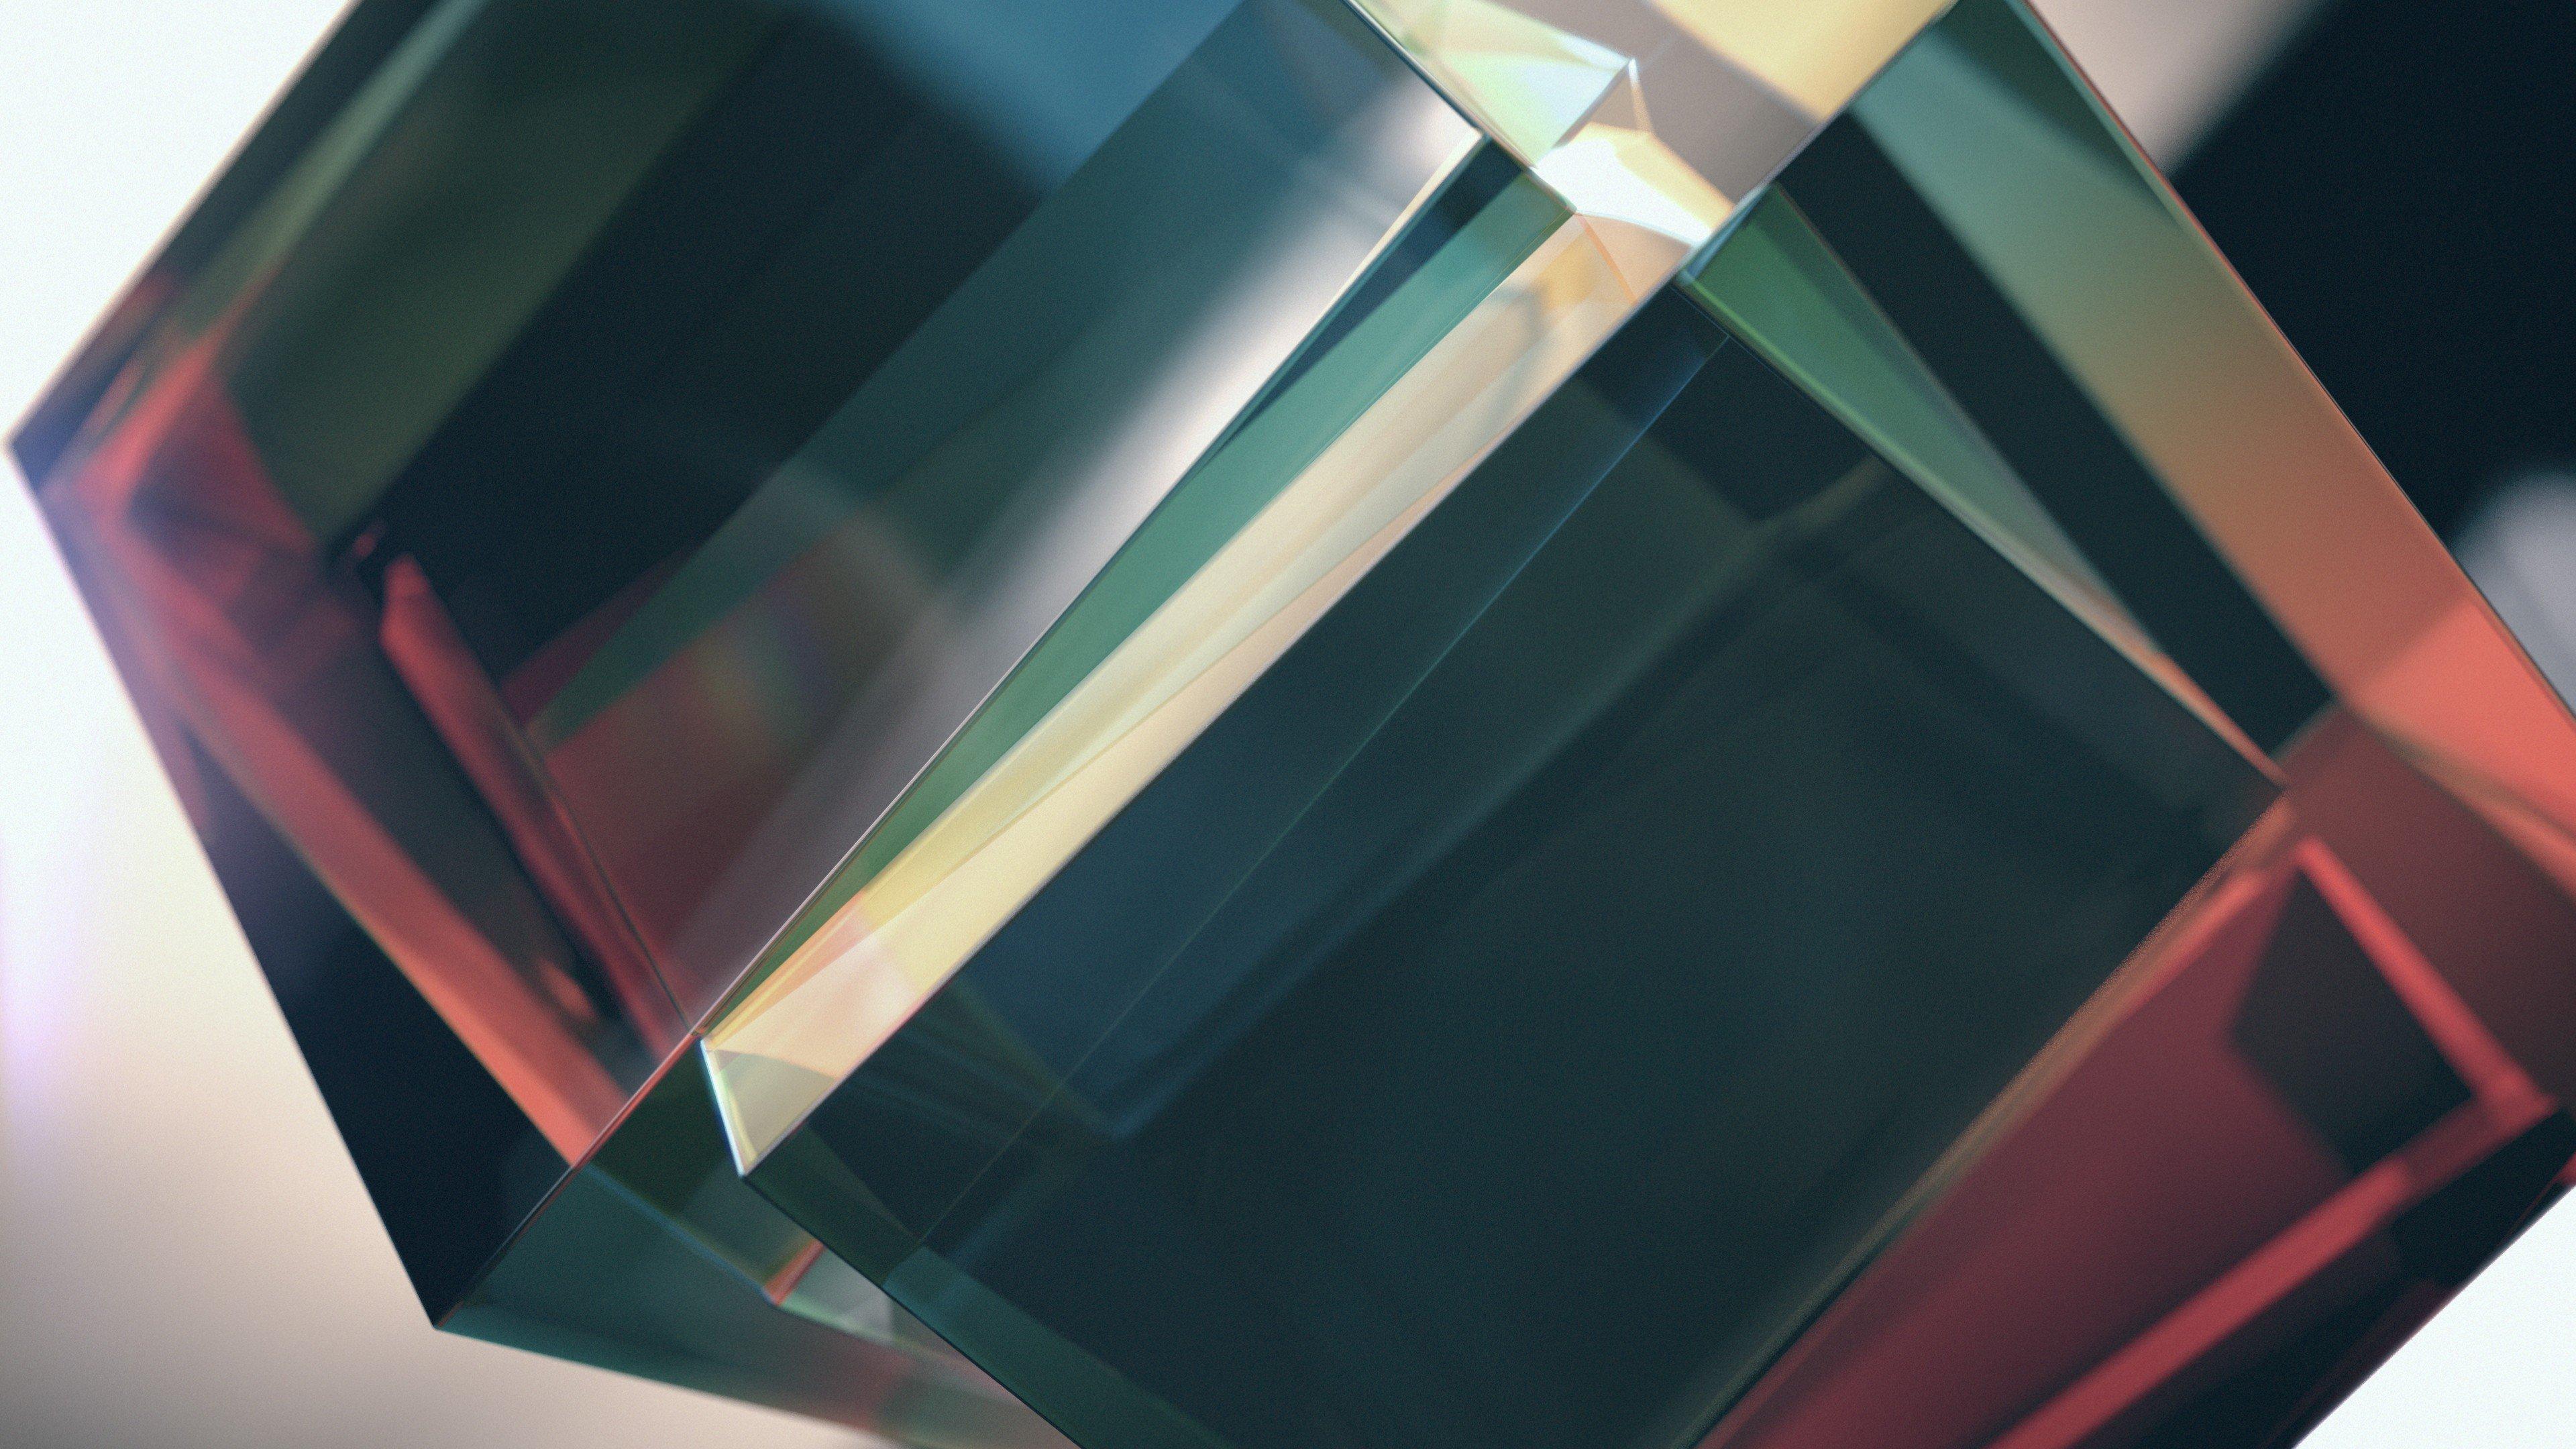 Cube minimalism abstract prism hd wallpapers desktop - Windows 10 4k wallpaper pack ...